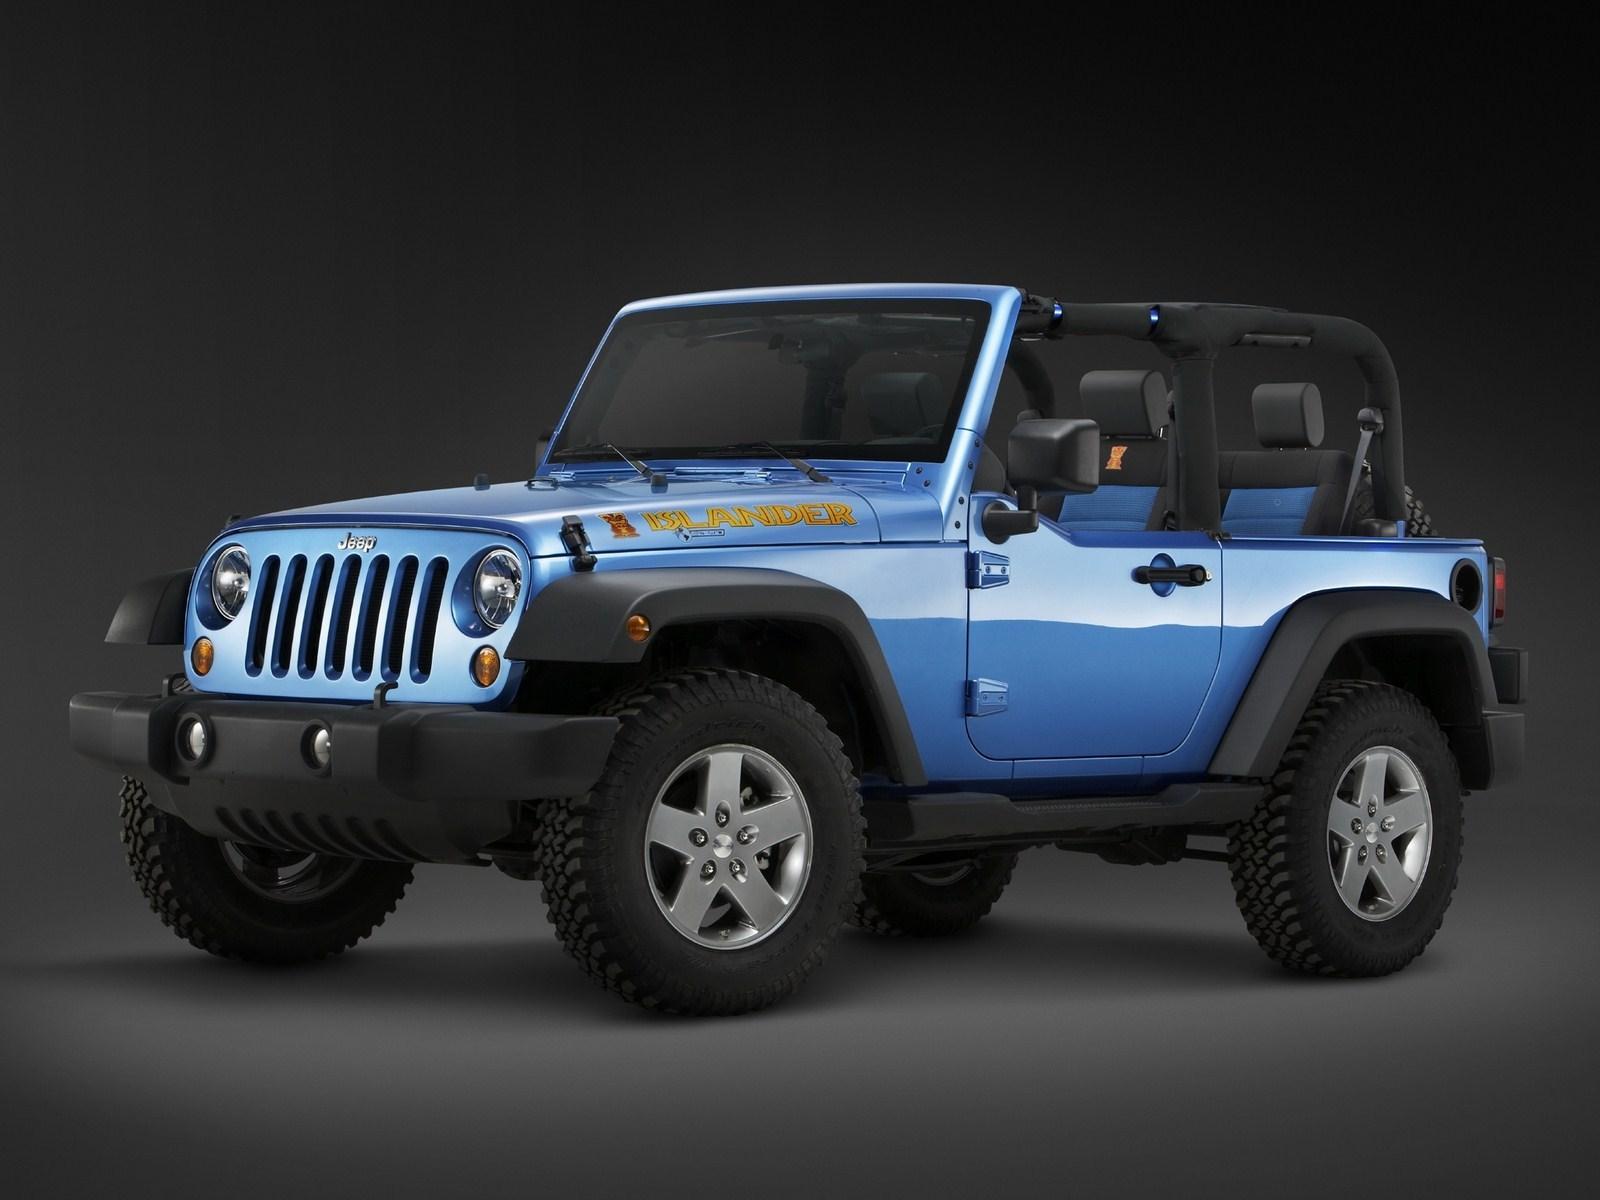 2010. Jeep Wrangler Islander (JK)